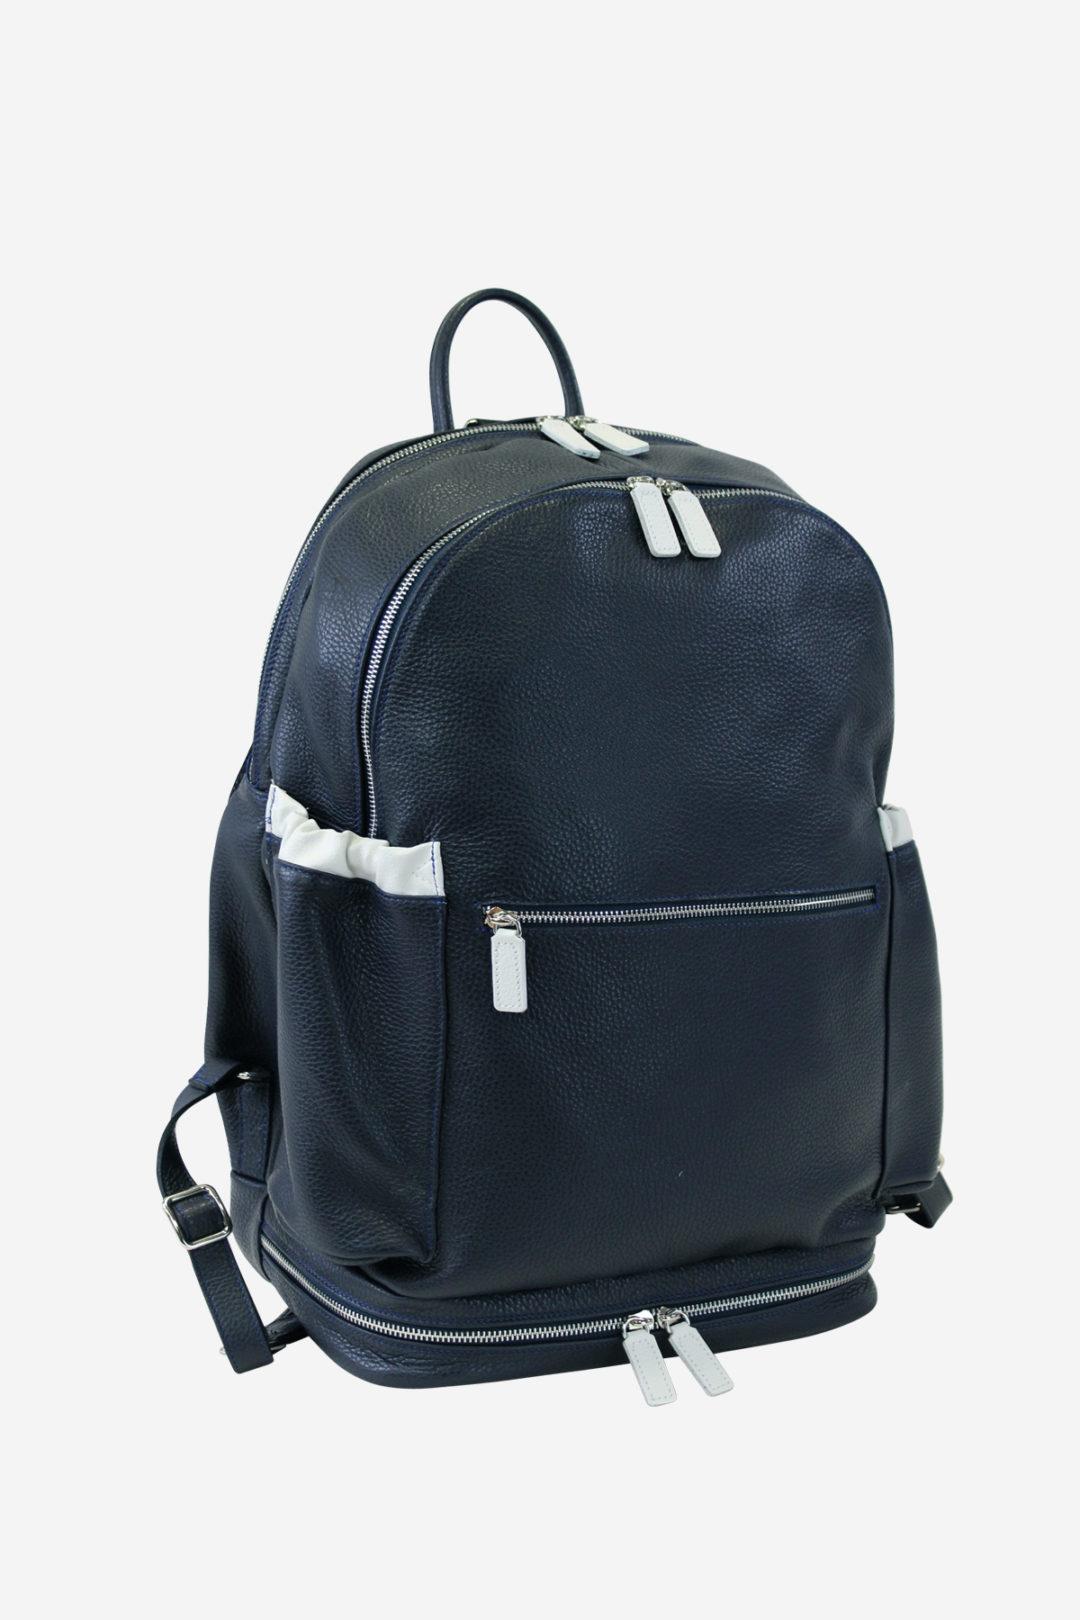 Multisport Backpack blue leather waterproof resistant outdoor